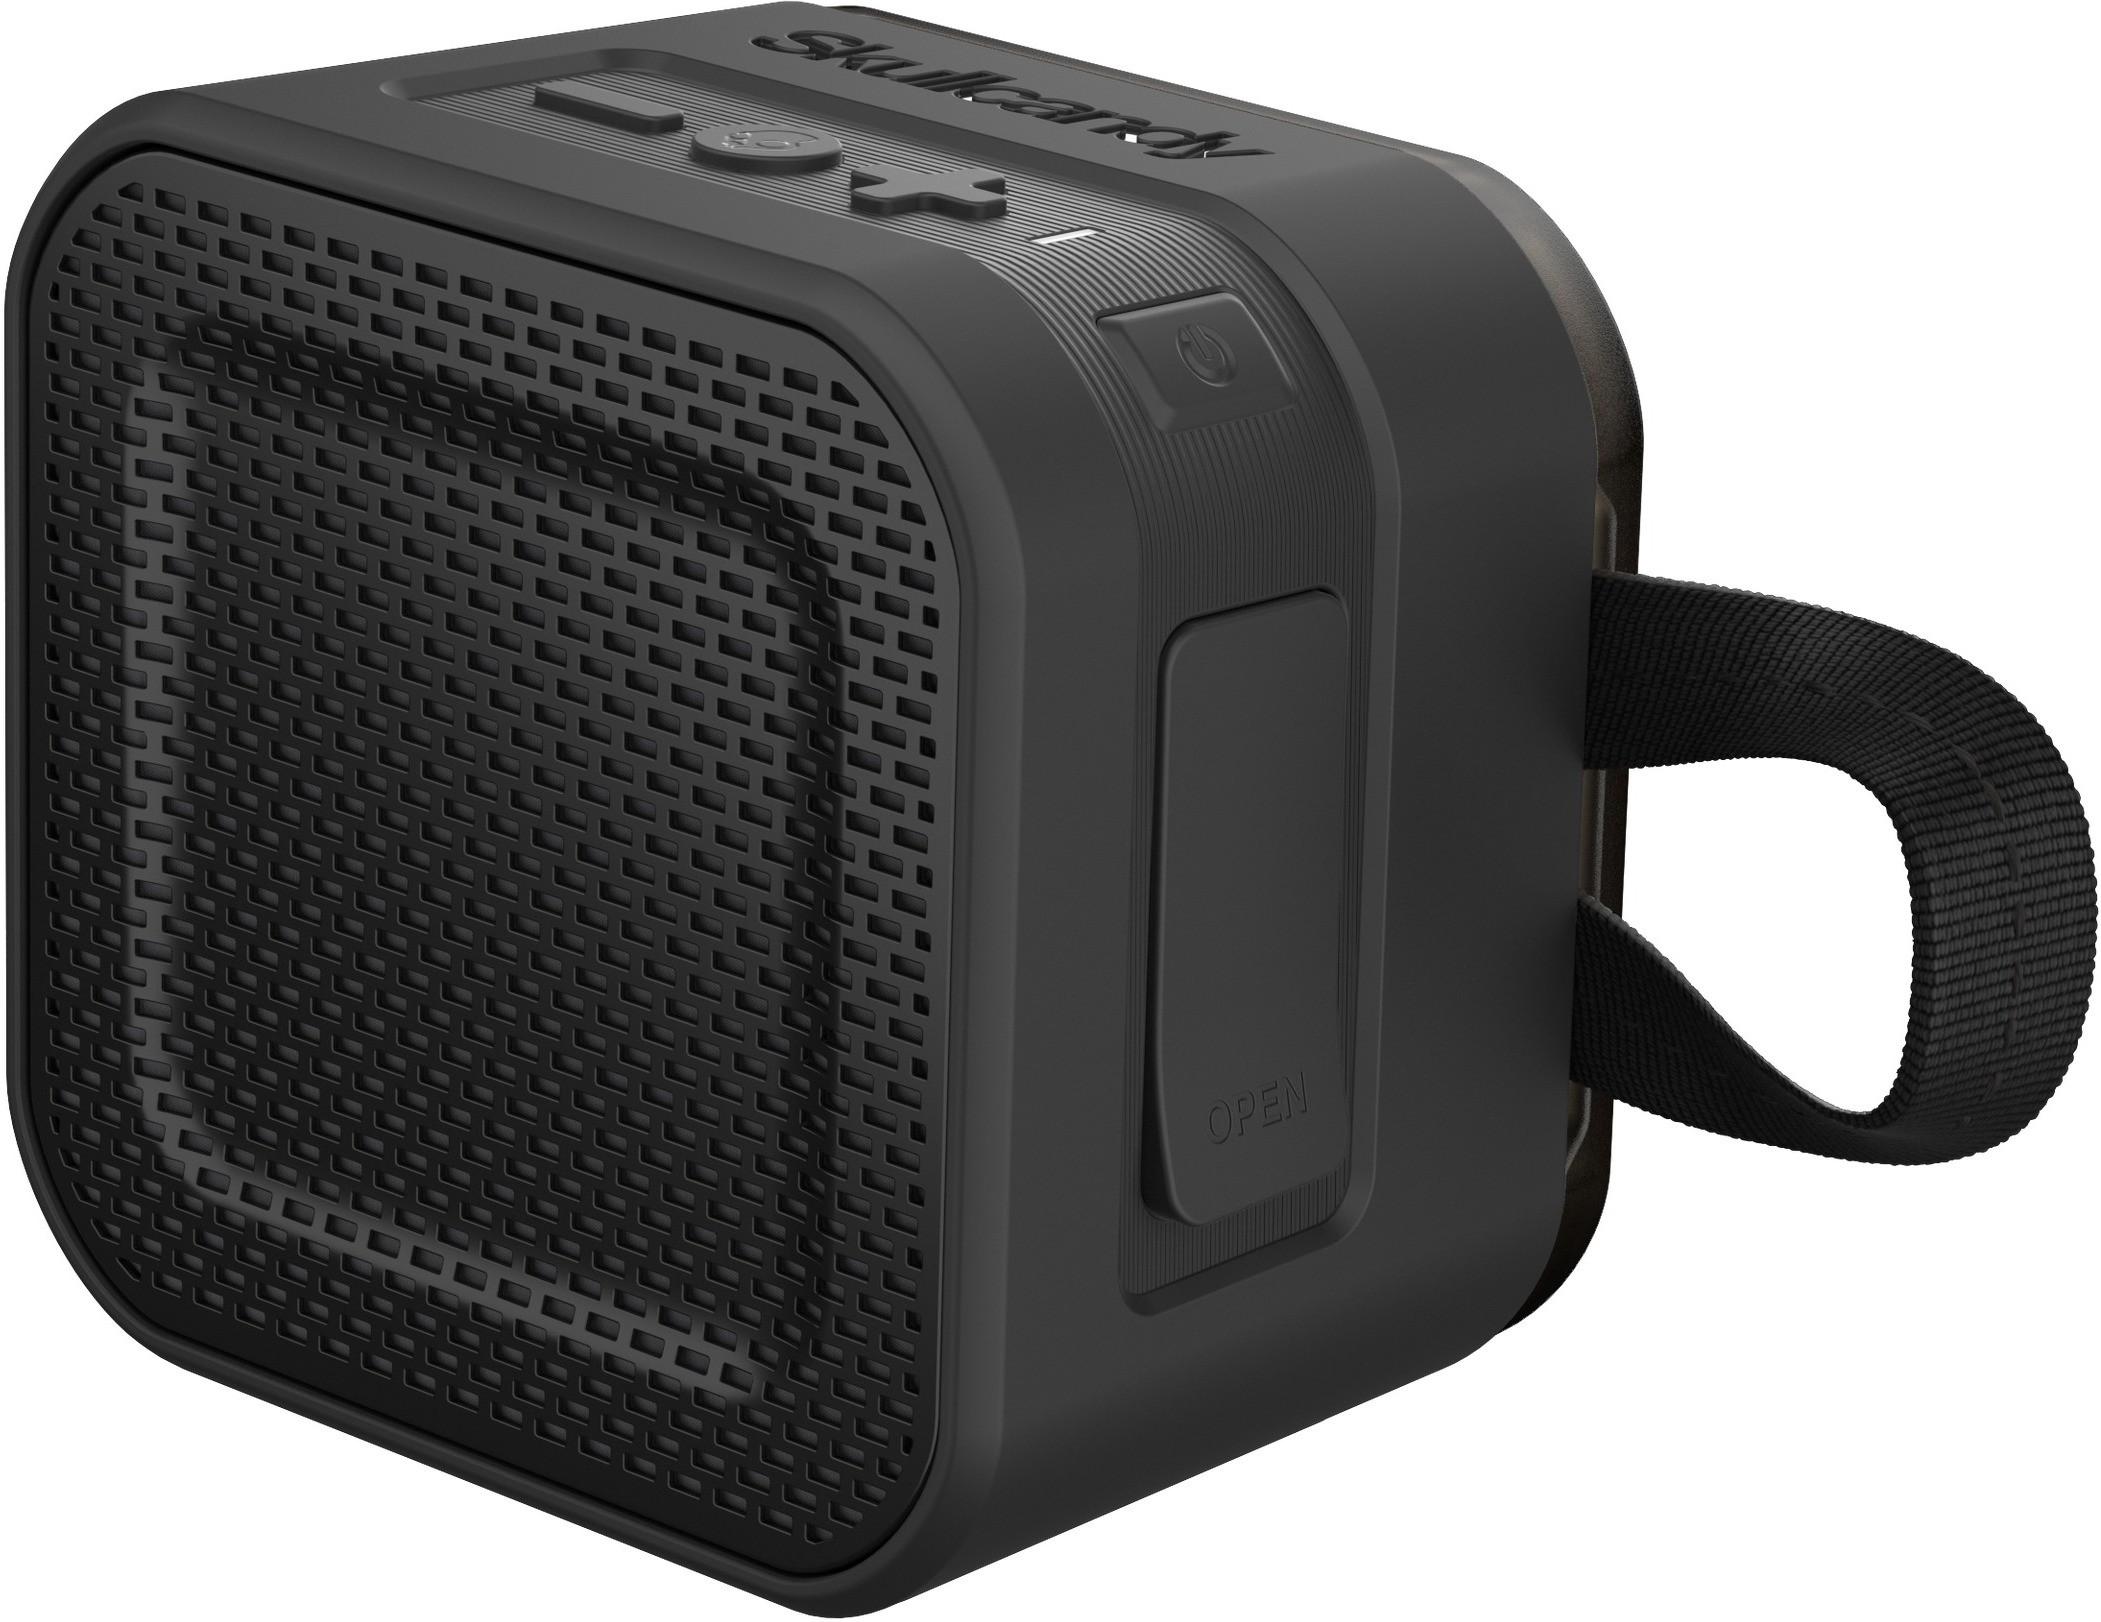 Skullcandy S7PBW-J582 Barricade Mini Portable Bluetooth Mobile/Tablet Speaker(Black, 1.0 Channel)